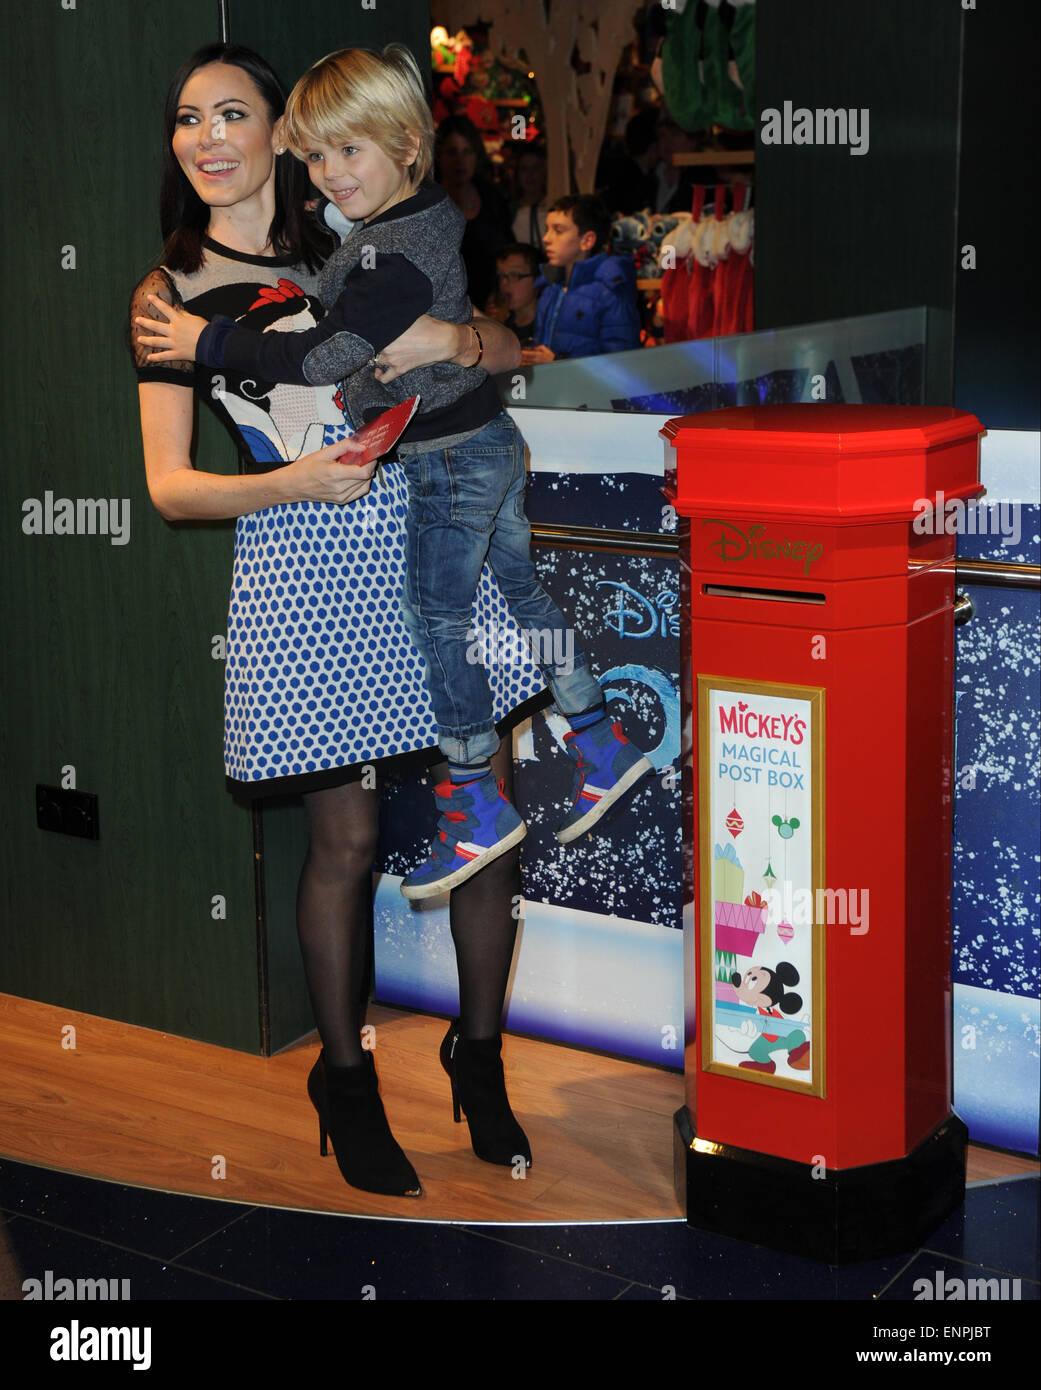 Disney Stores Stockfotos & Disney Stores Bilder - Alamy